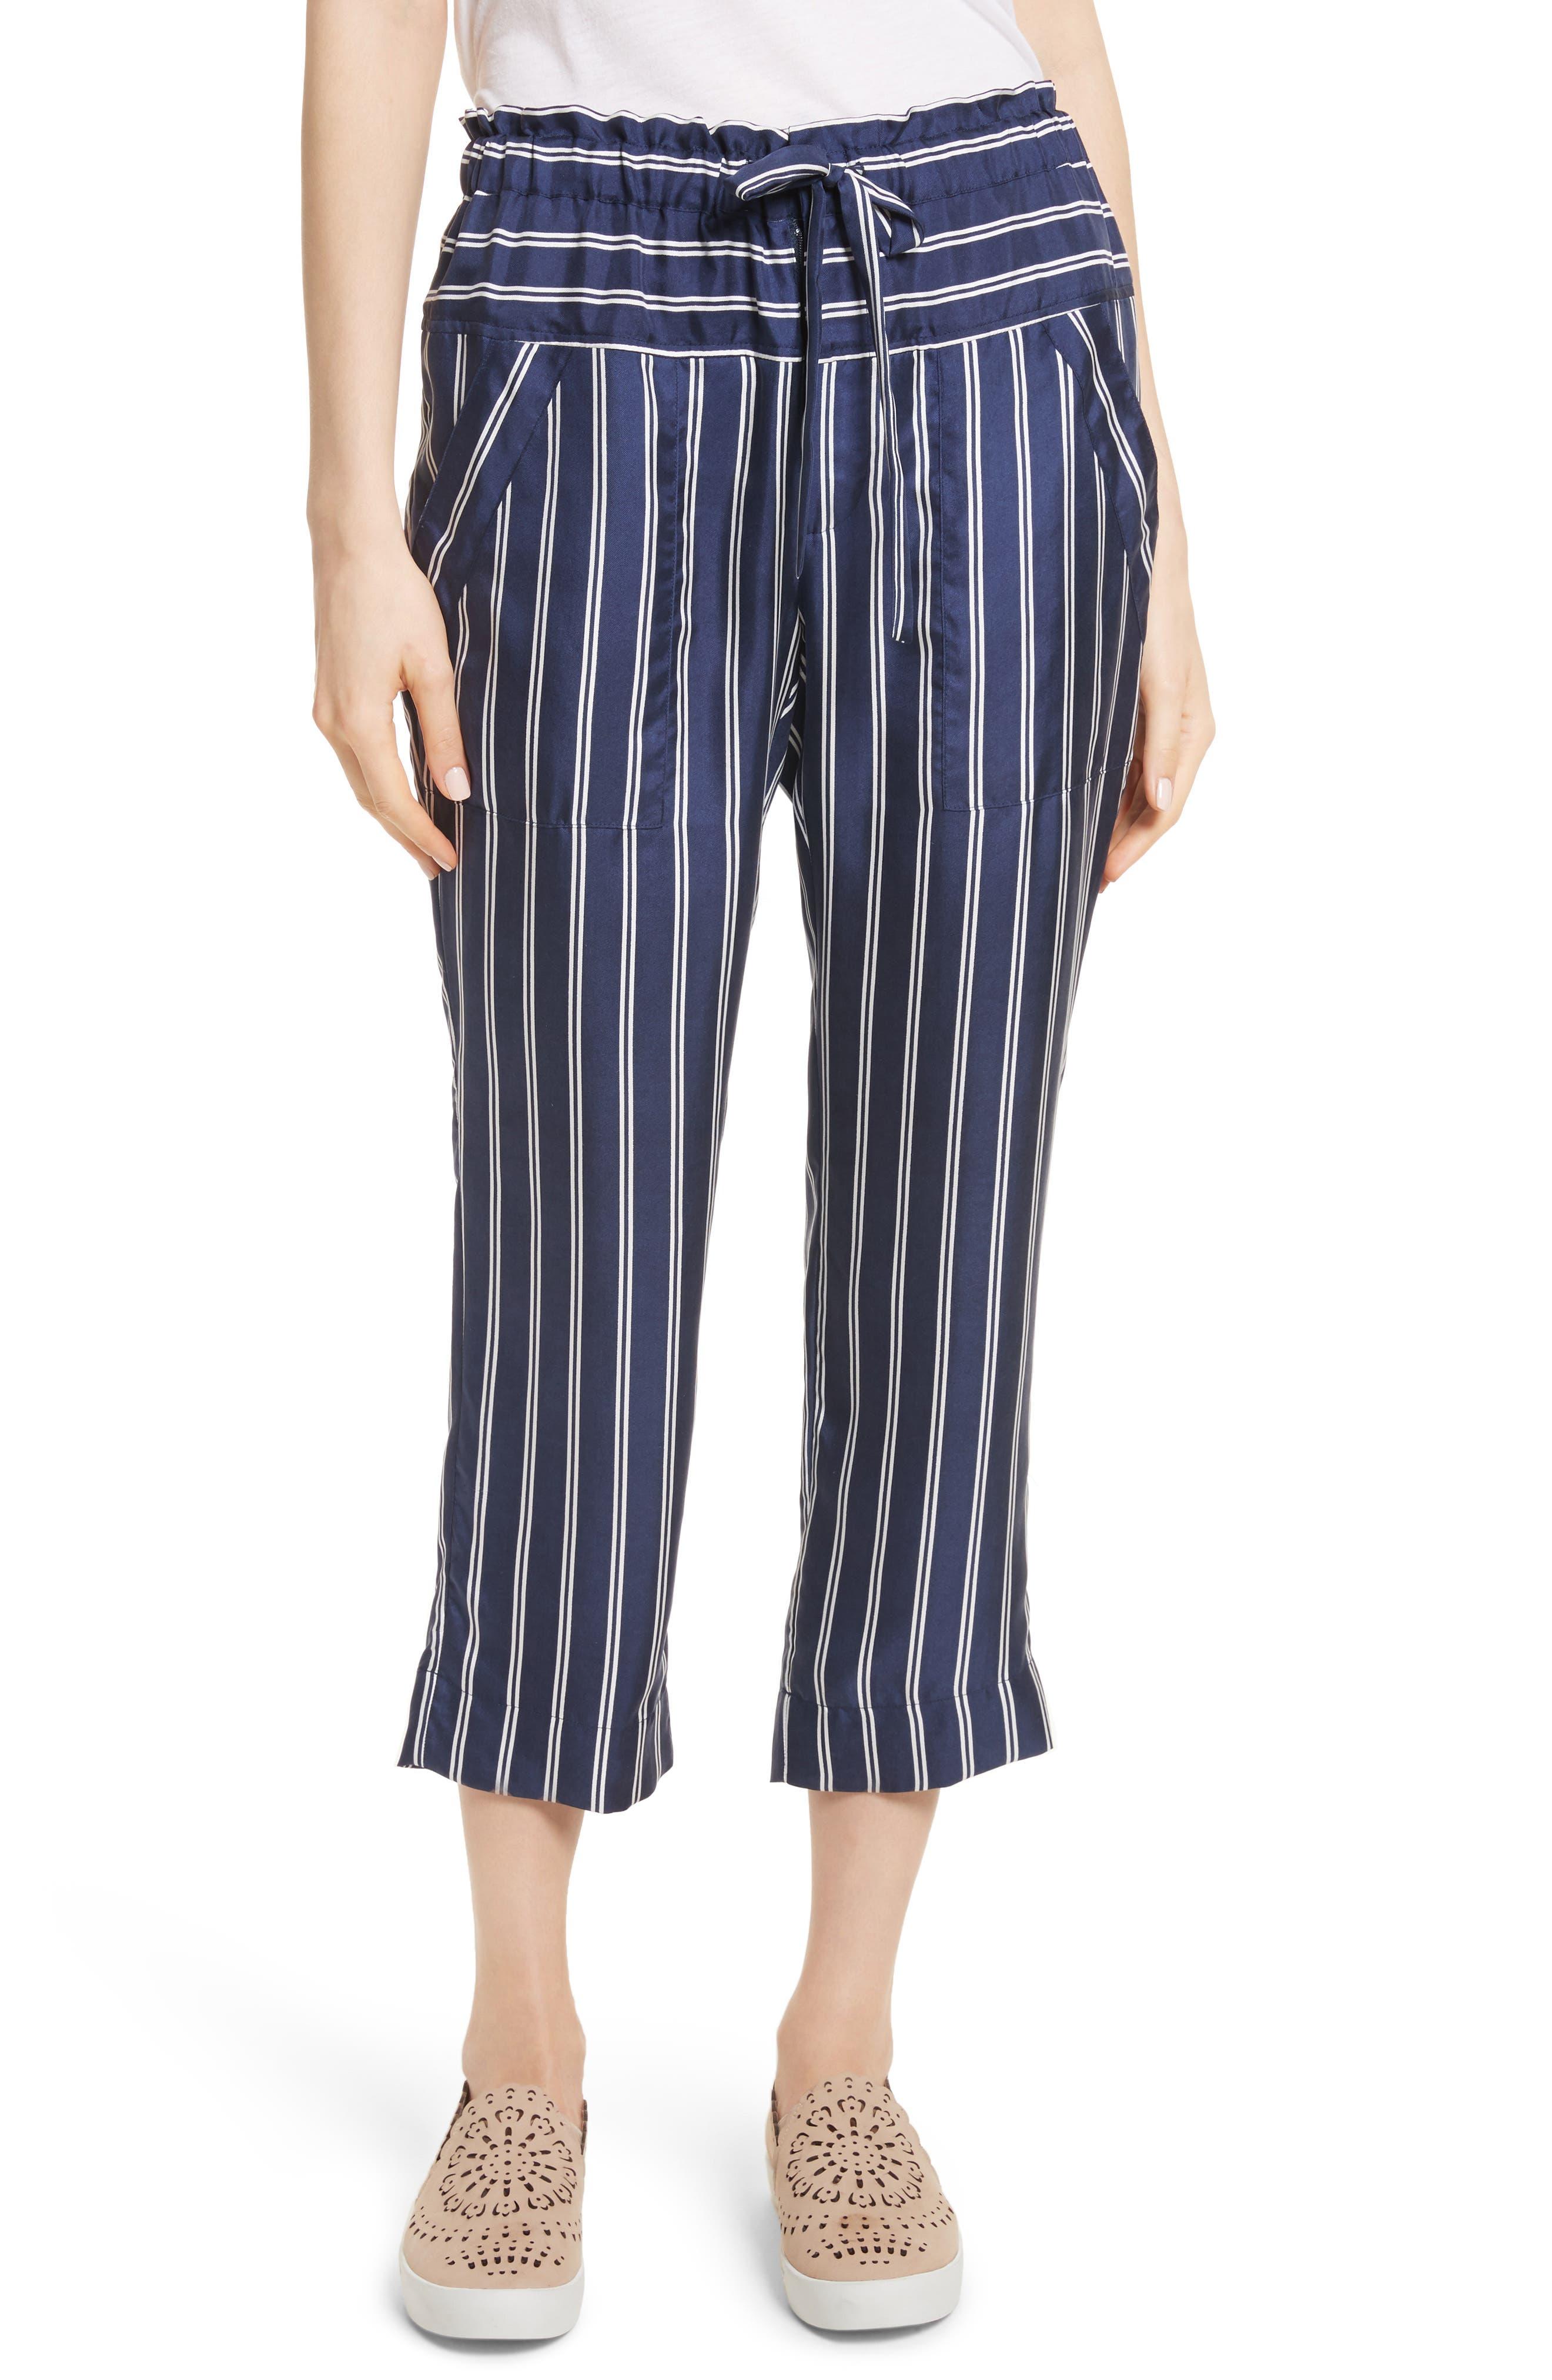 Addiena Stripe Silk Pants,                             Main thumbnail 1, color,                             418